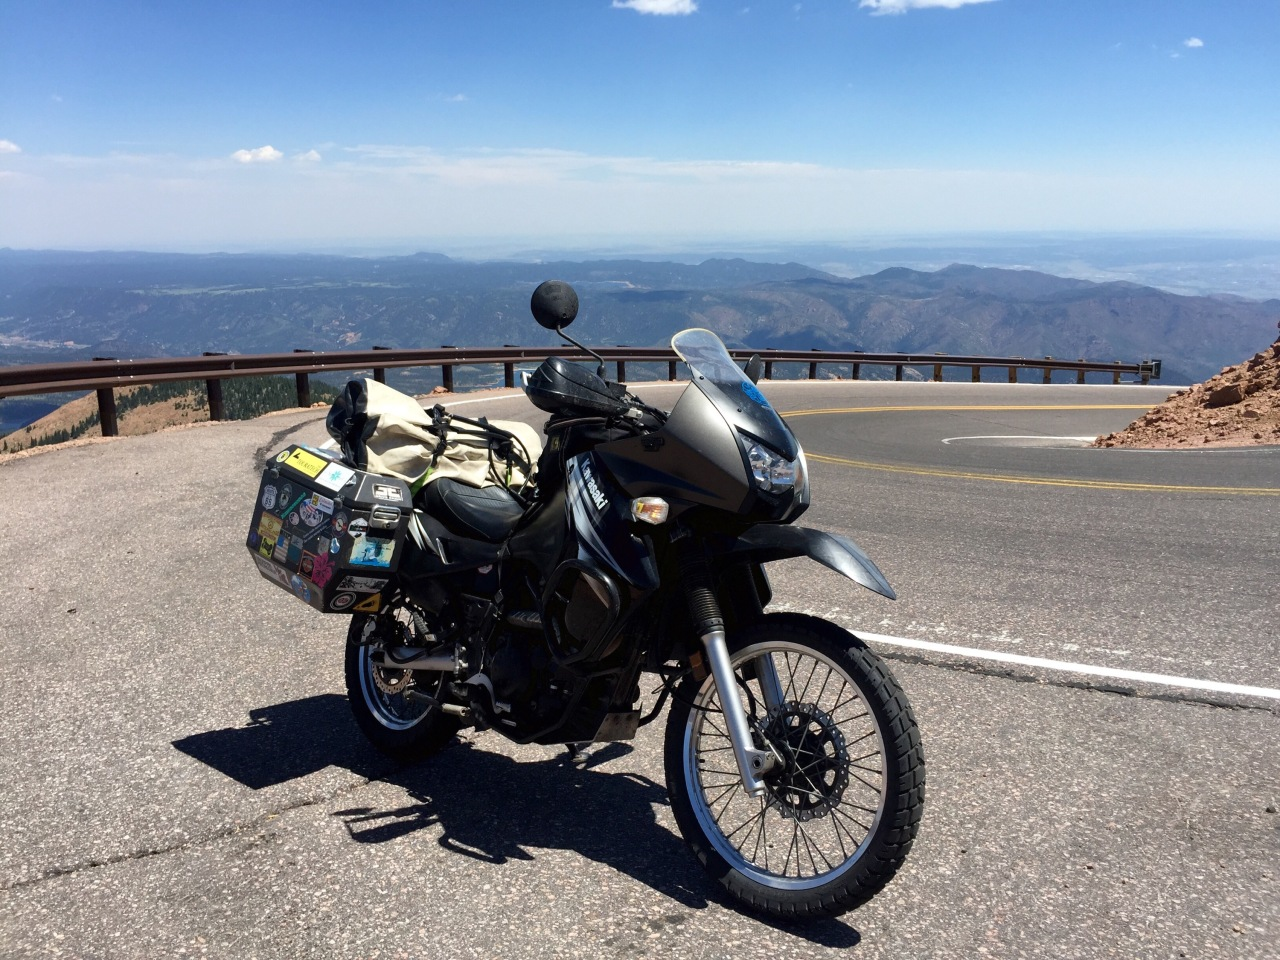 Riding to Colorado…finally back on thebike